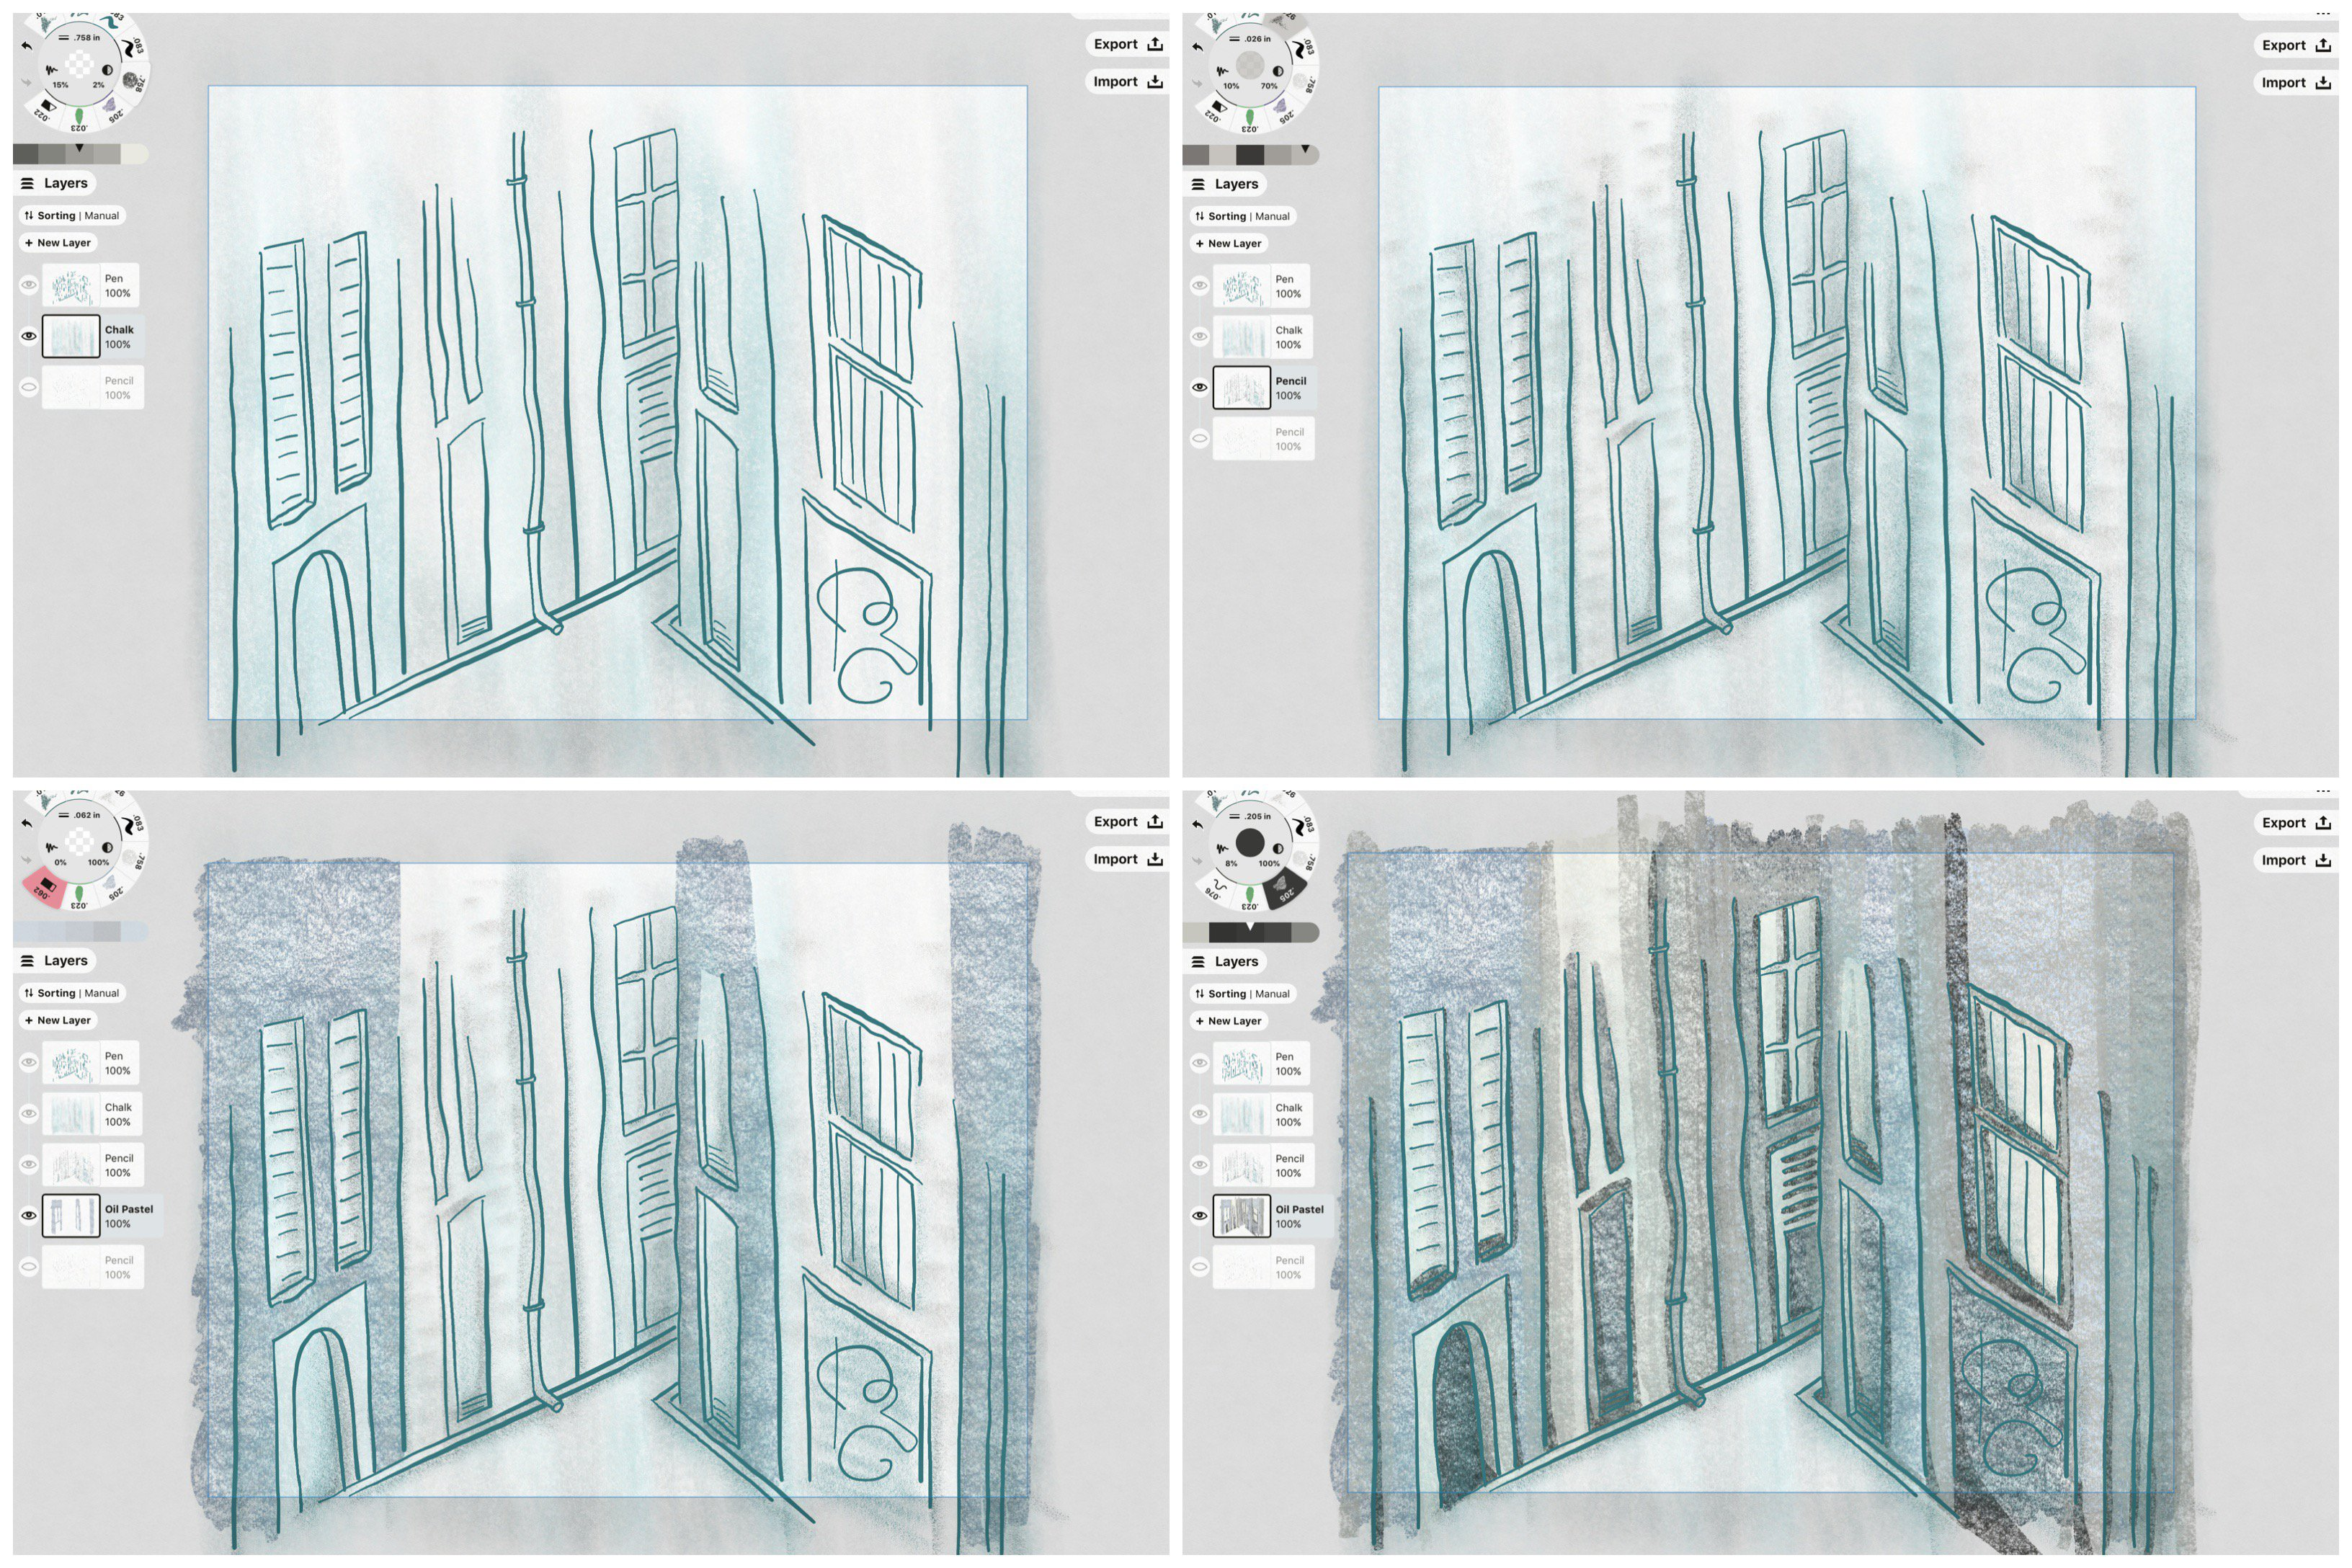 layers_illustration3.JPG